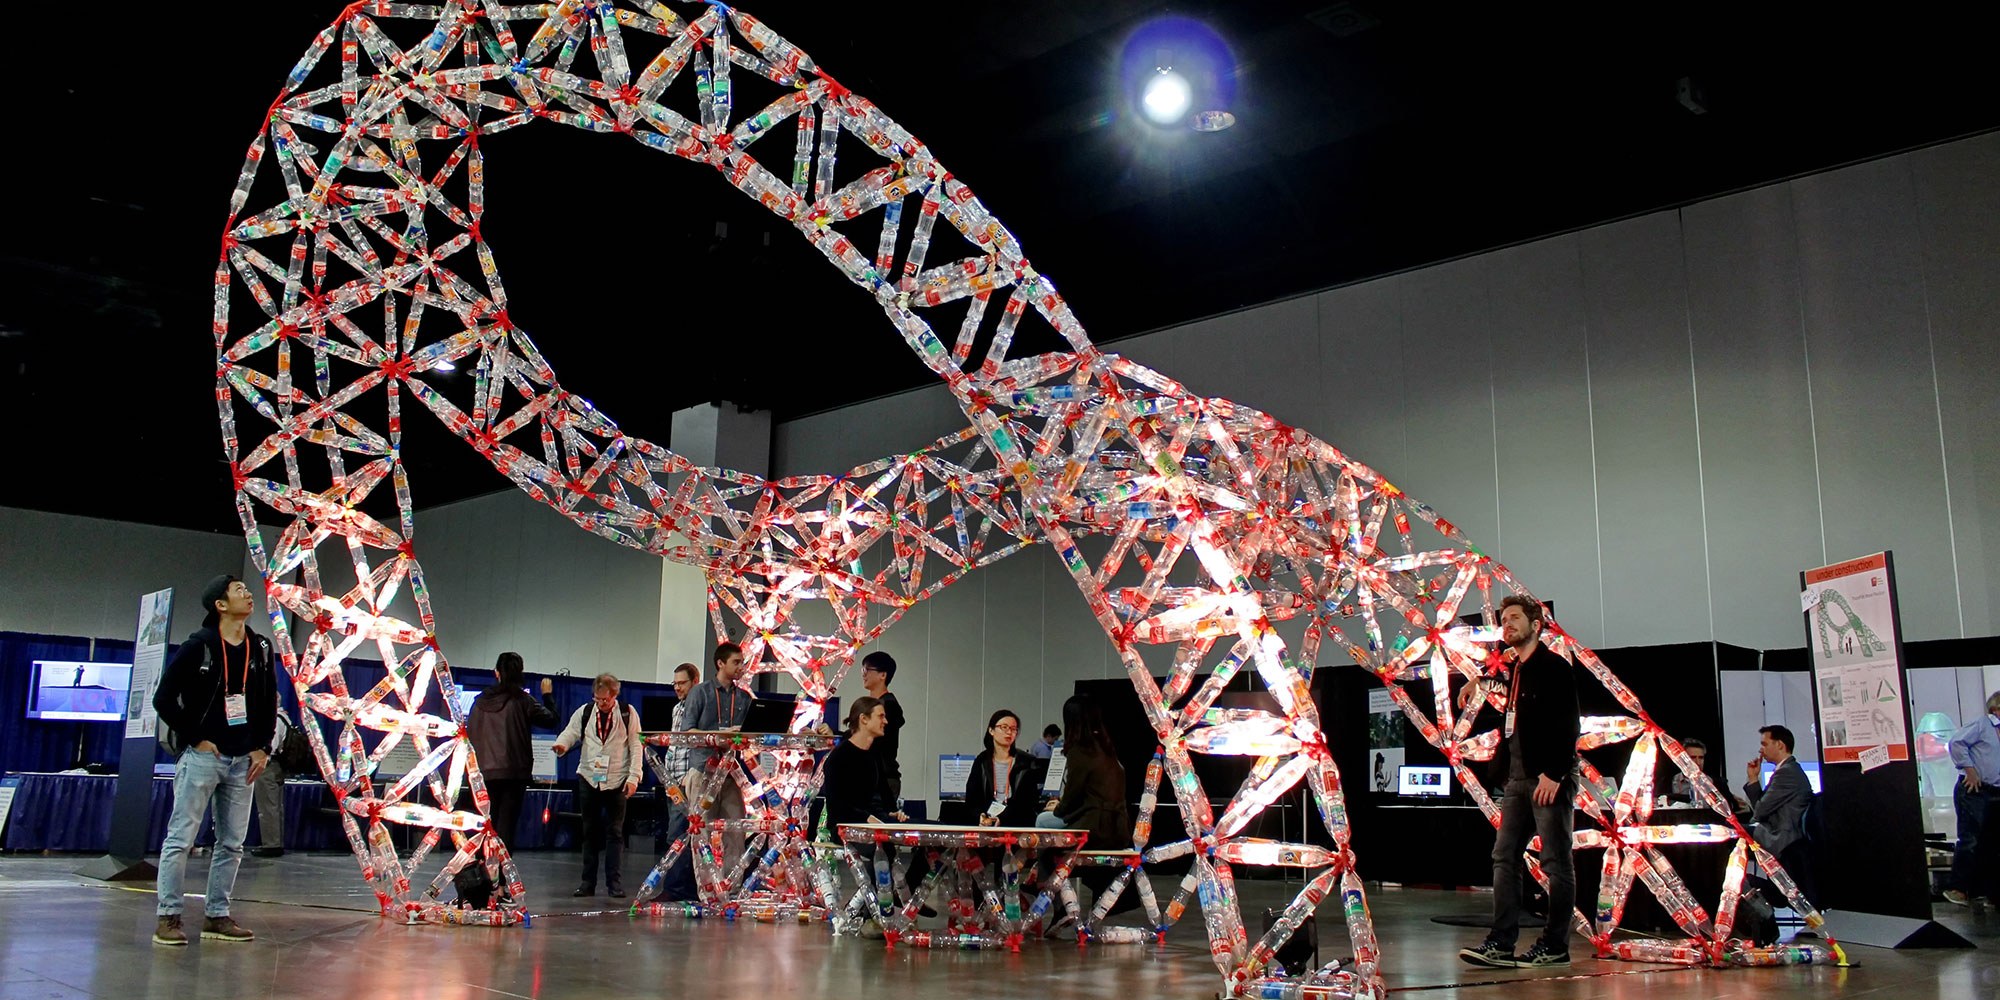 Karamba3d Parametric Engineering Dome Light Wiring Diagram Vw Bug Trussfab Pavilion